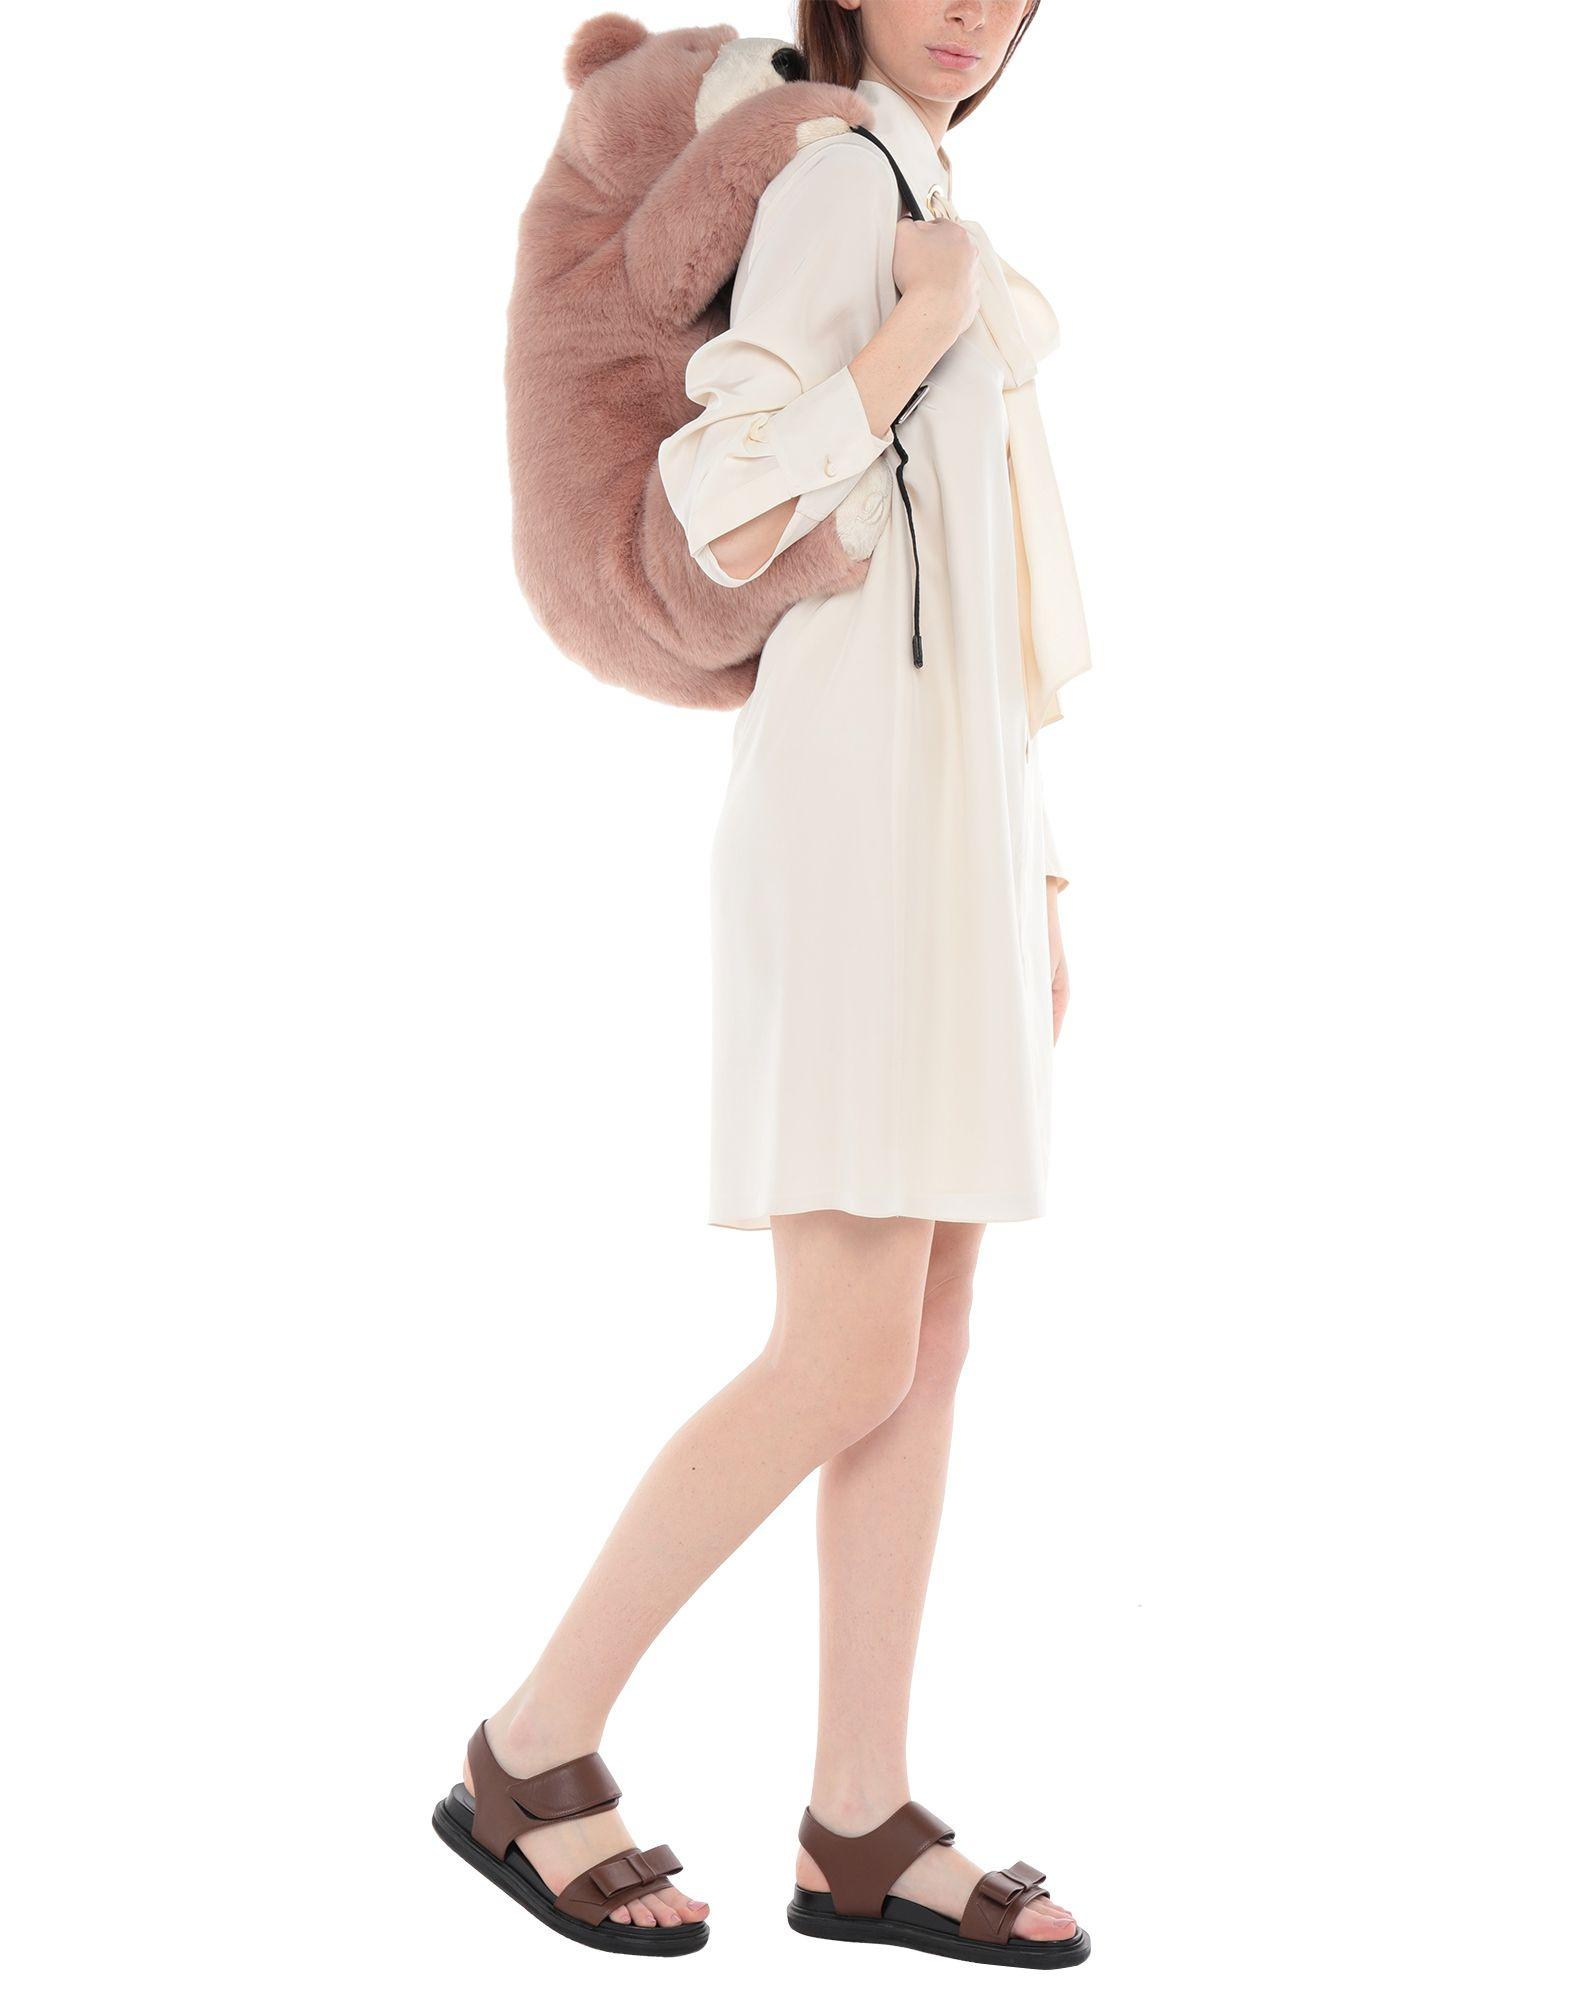 Dolce & Gabbana Fur Backpacks & Bum Bags in Pastel Pink (Pink)